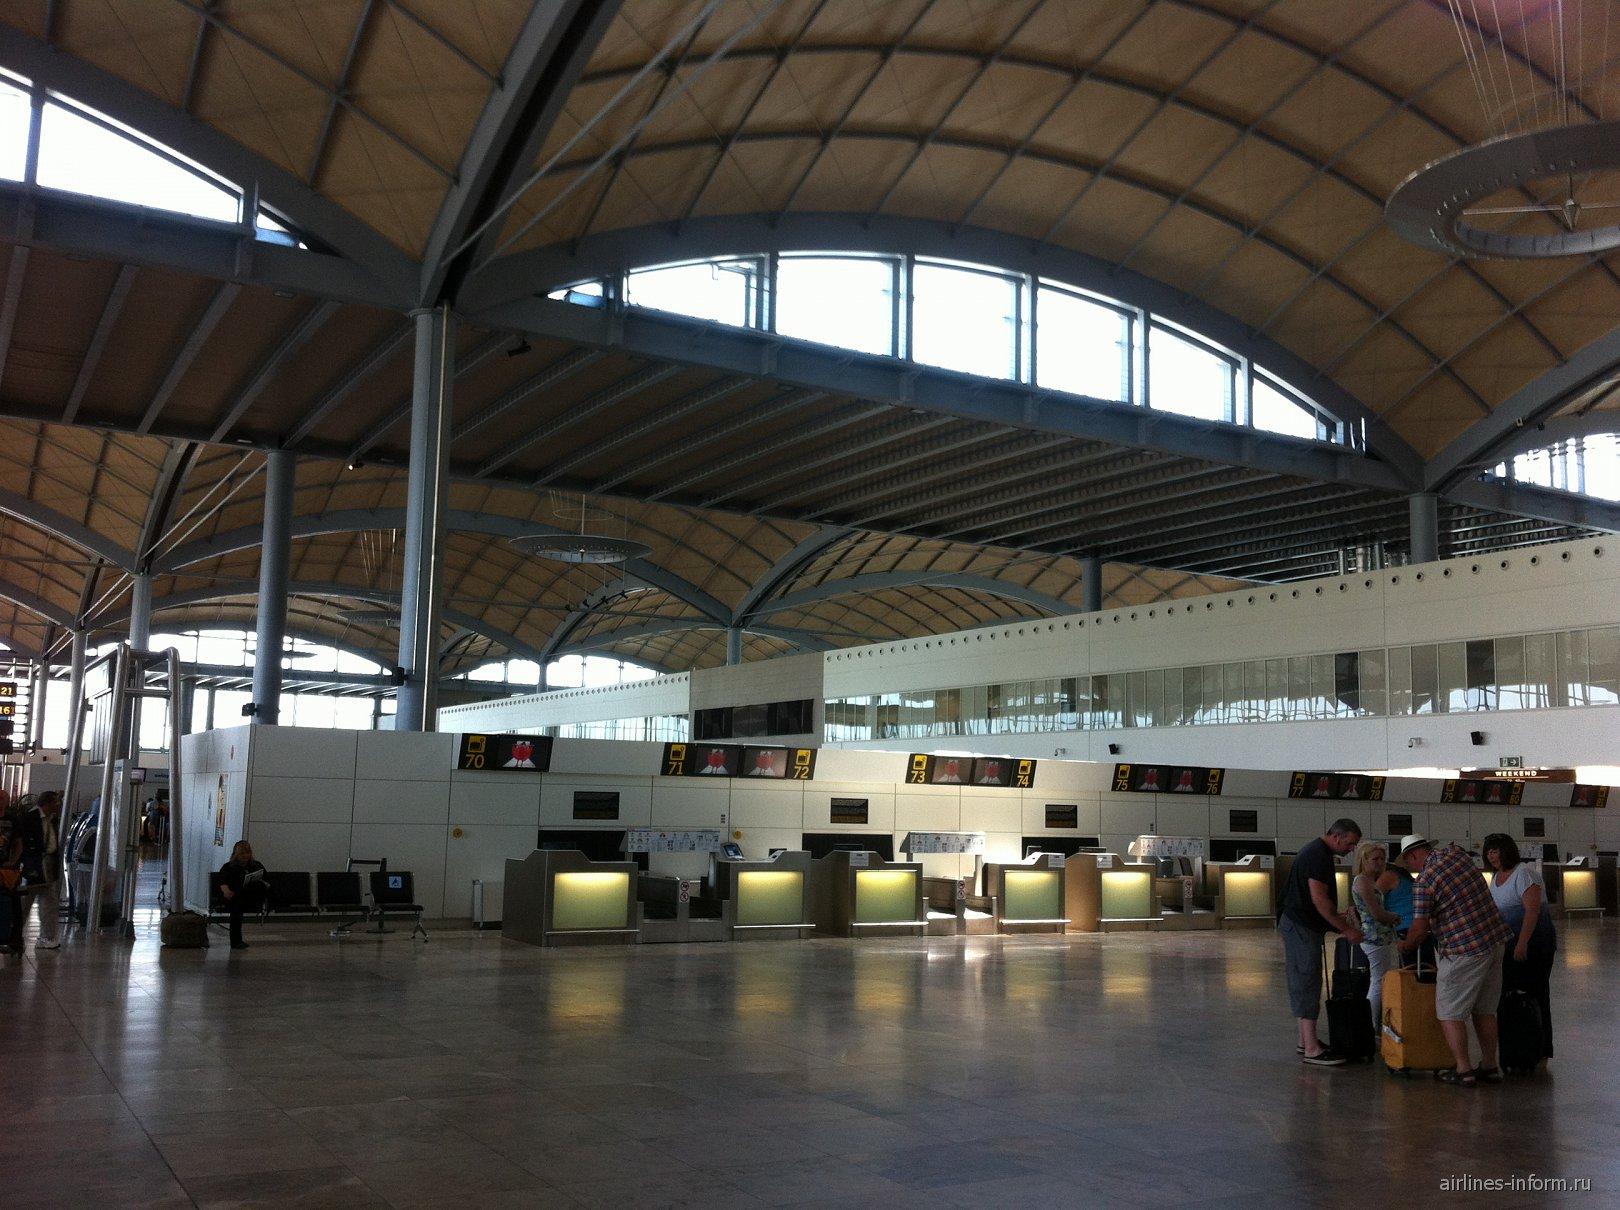 Интерьер терминала аэропорта Аликанте